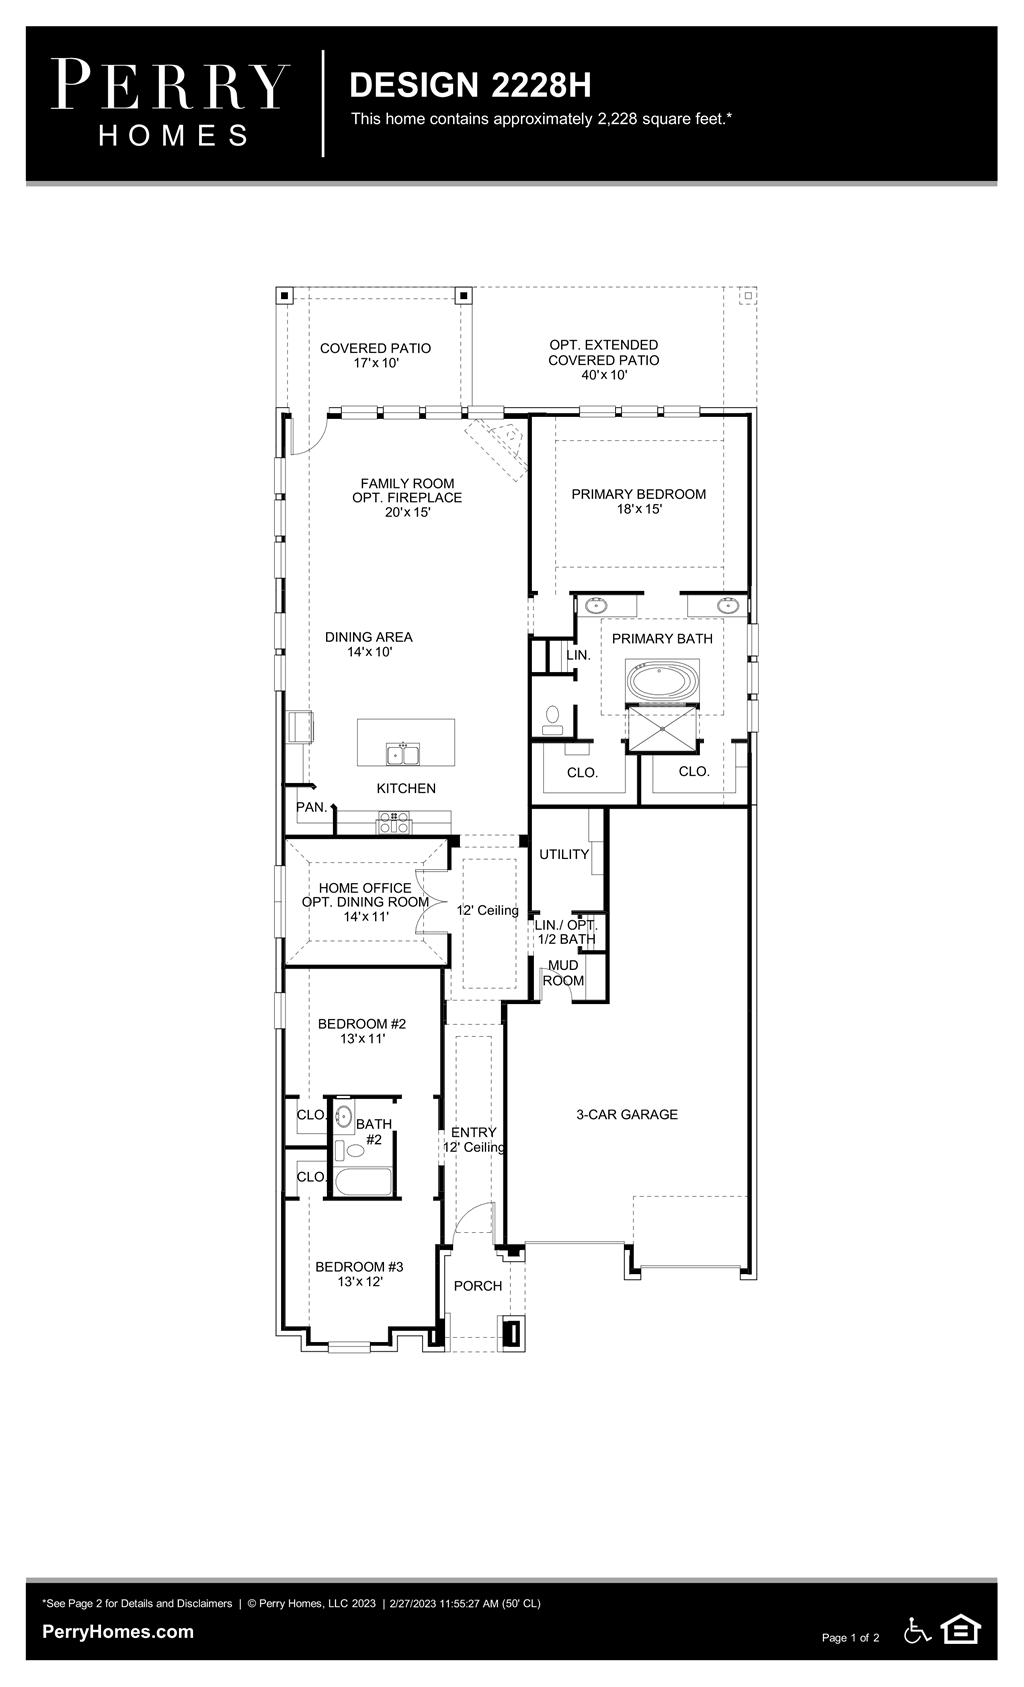 Floor Plan for 2228H